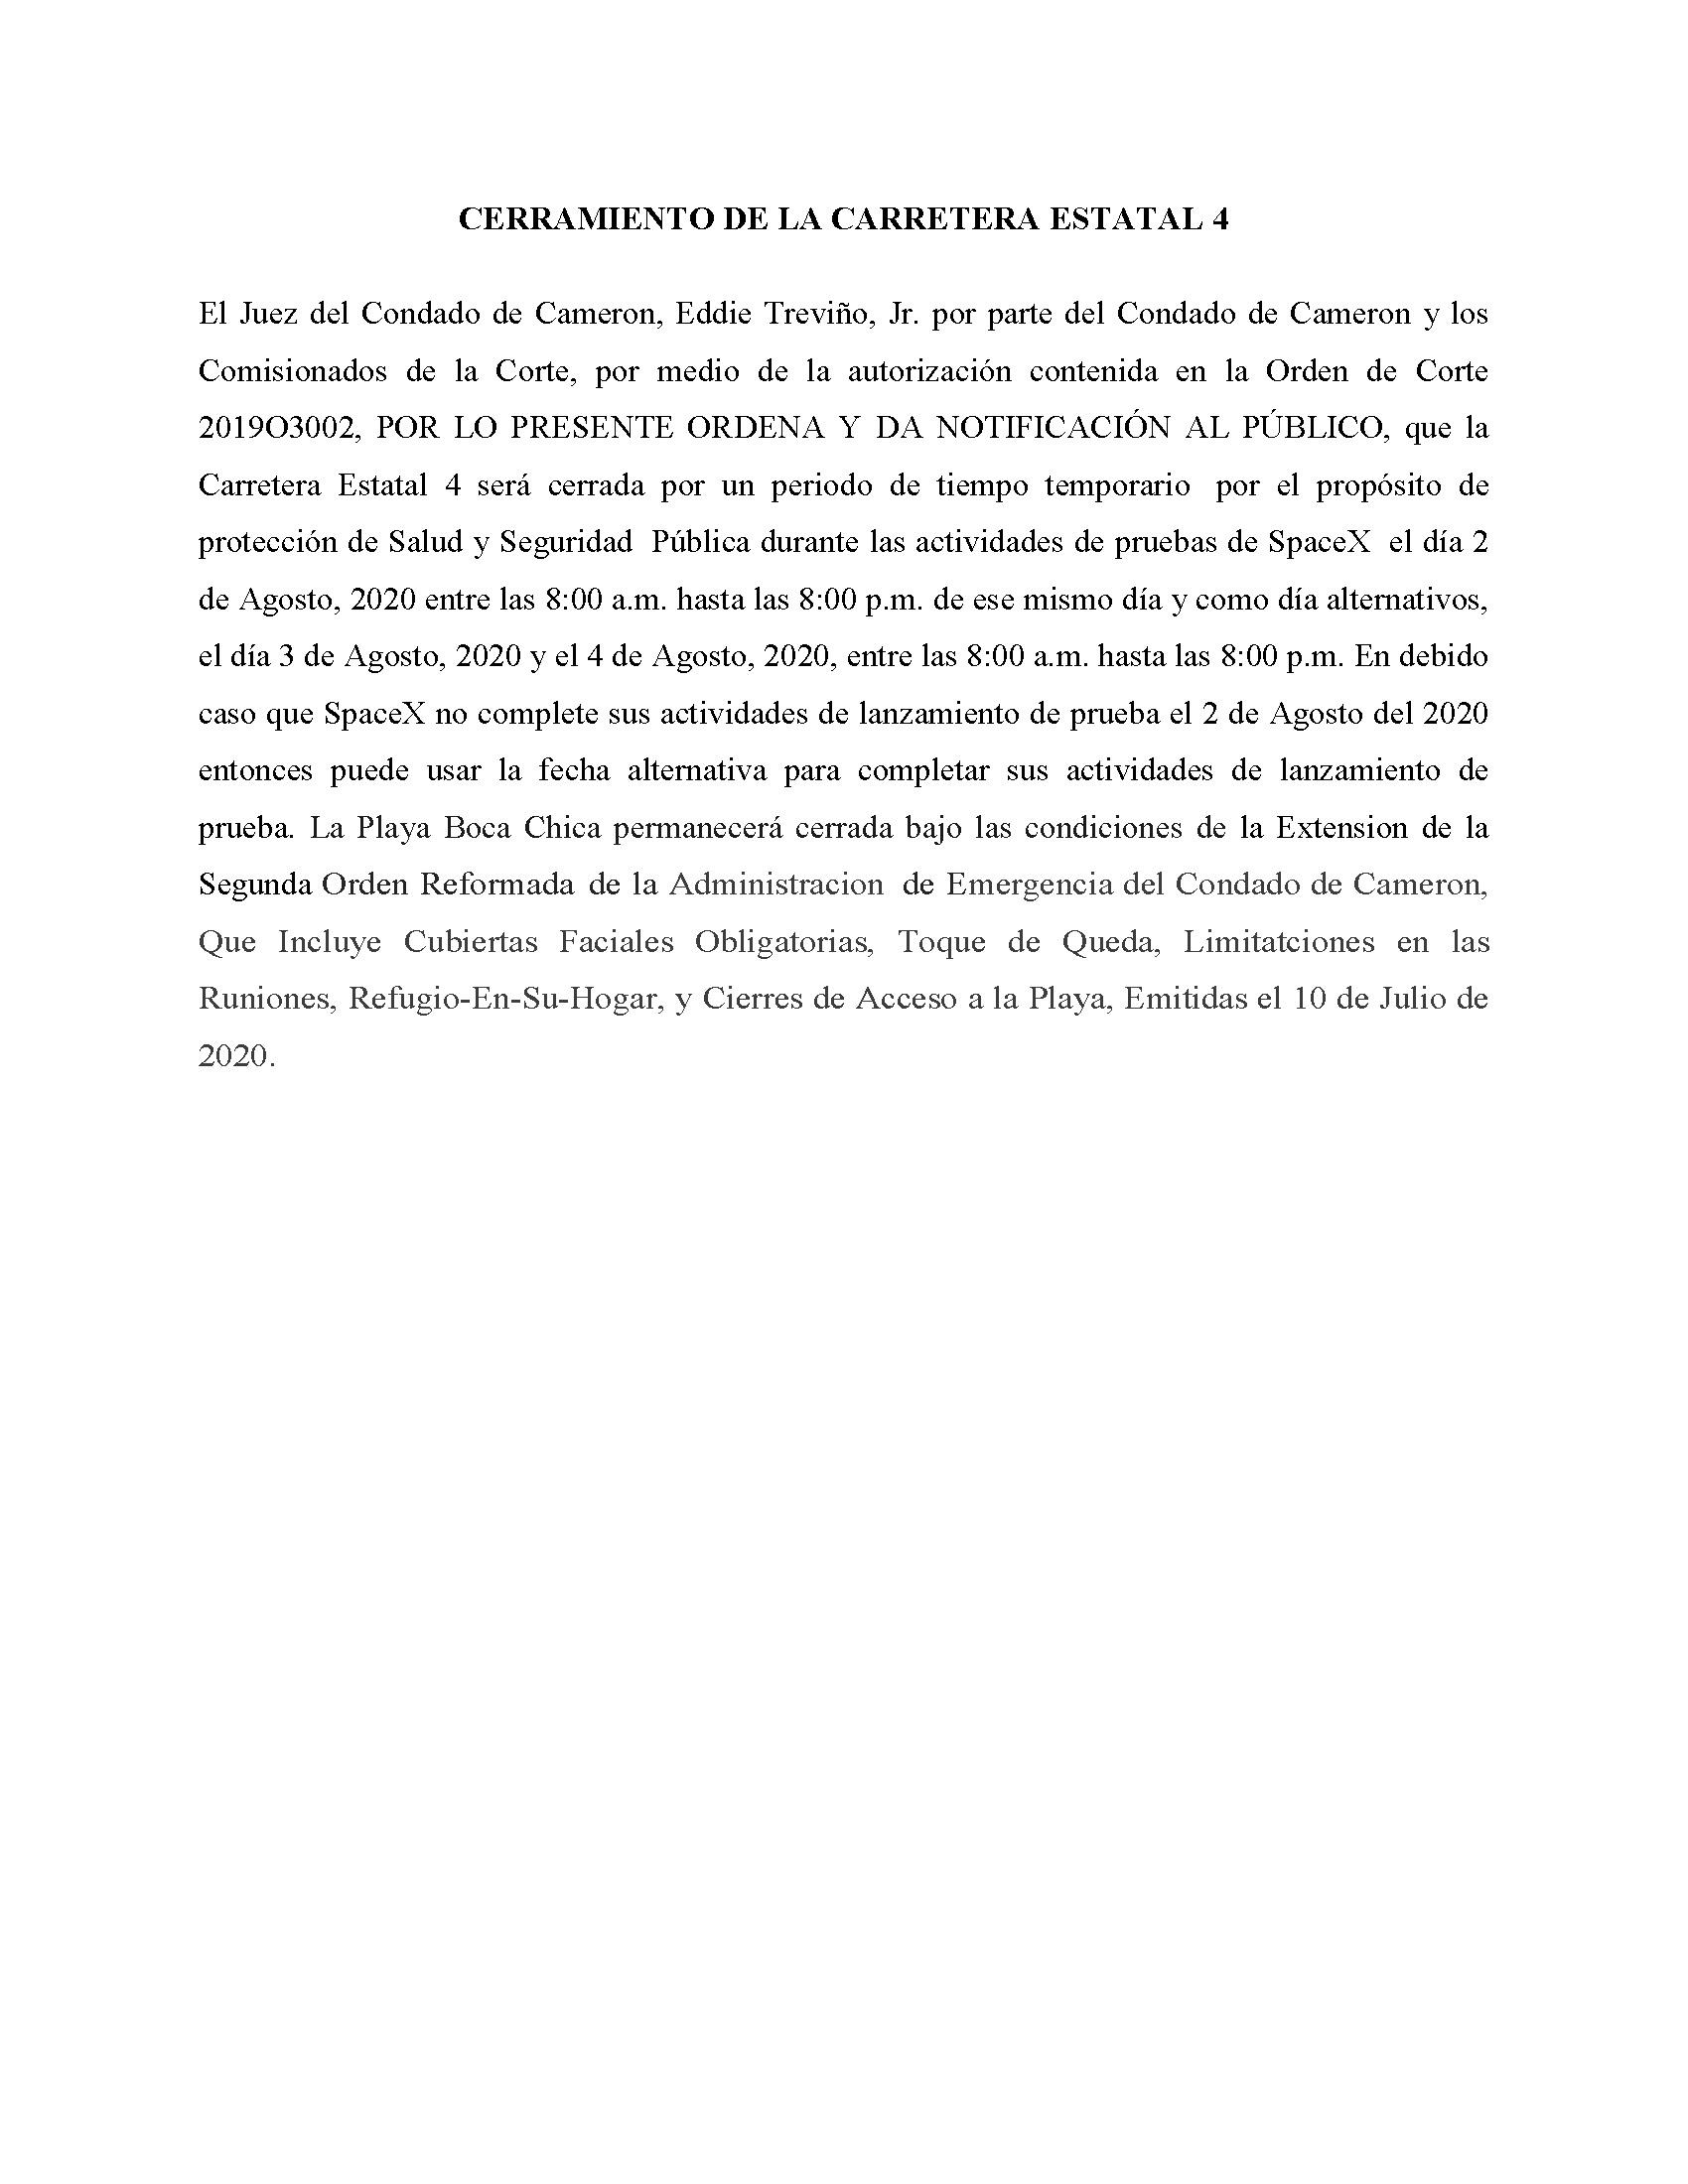 ORDER.CLOSURE OF HIGHWAY 4.SPANISH.08.02.20